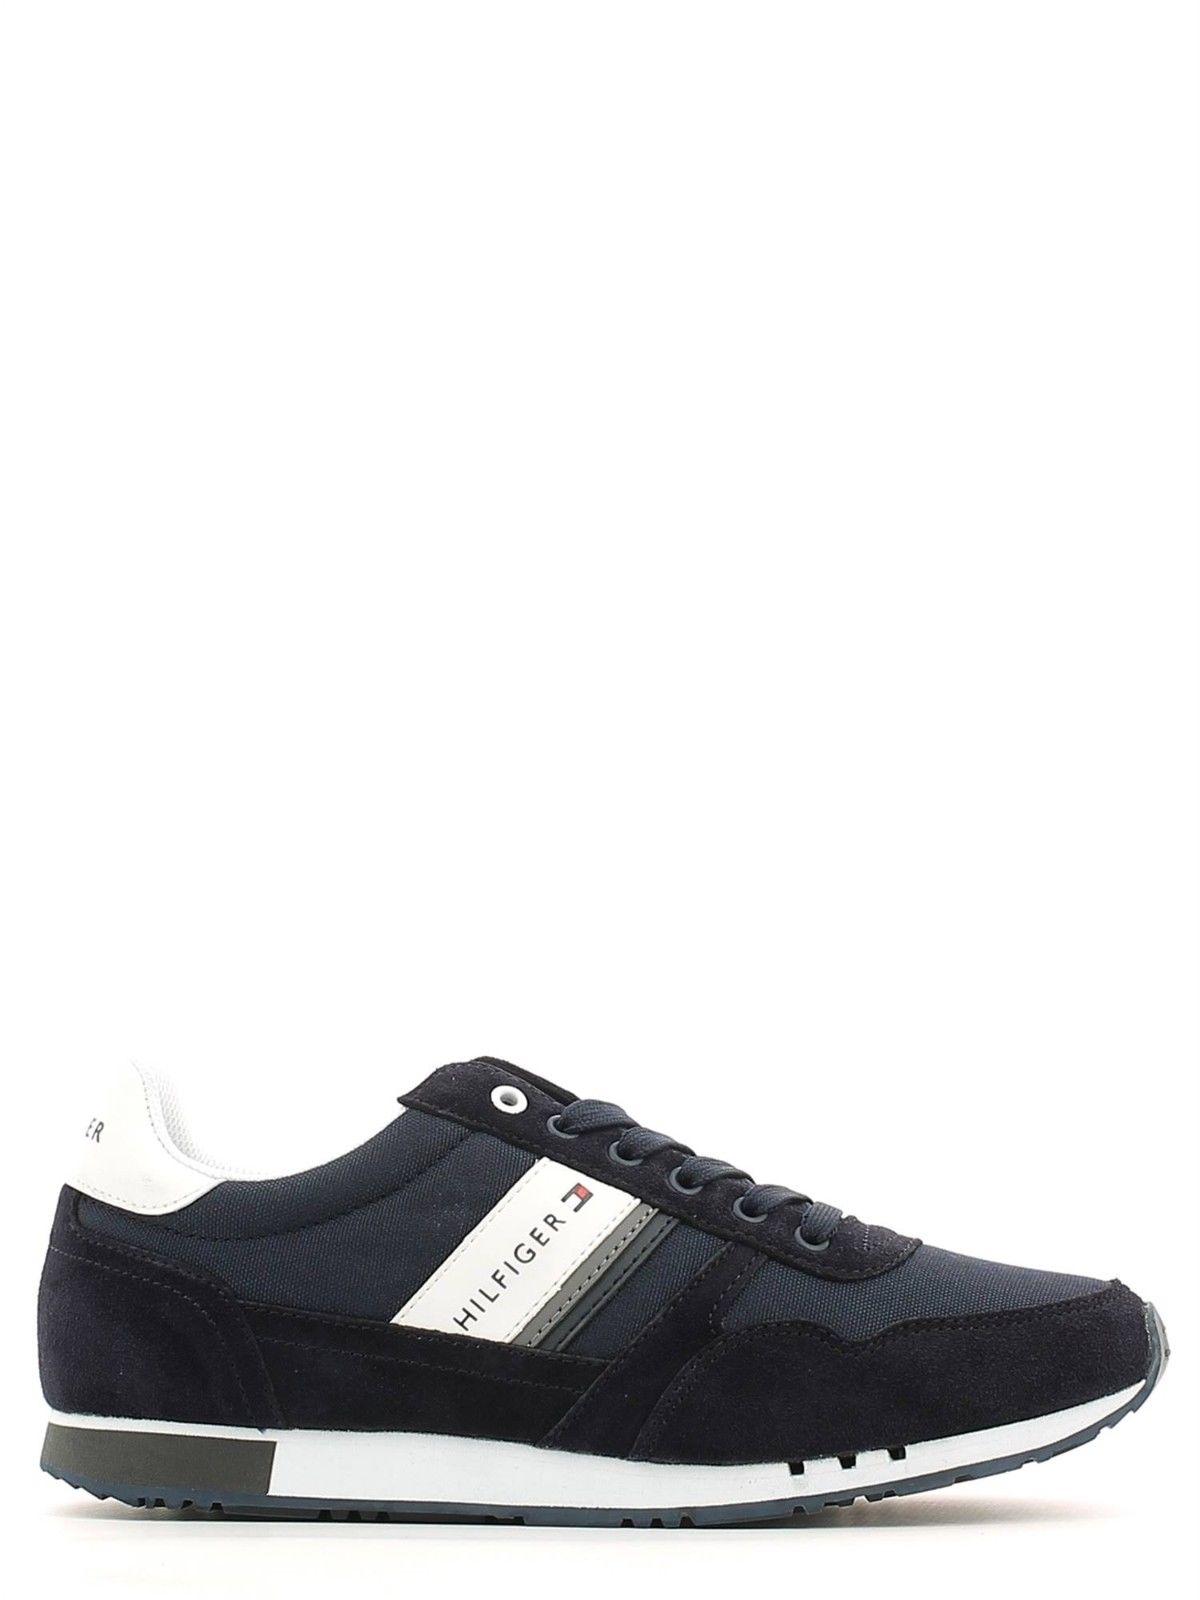 09d8740123 scarpe sneakers uomo tommy hilfiger original